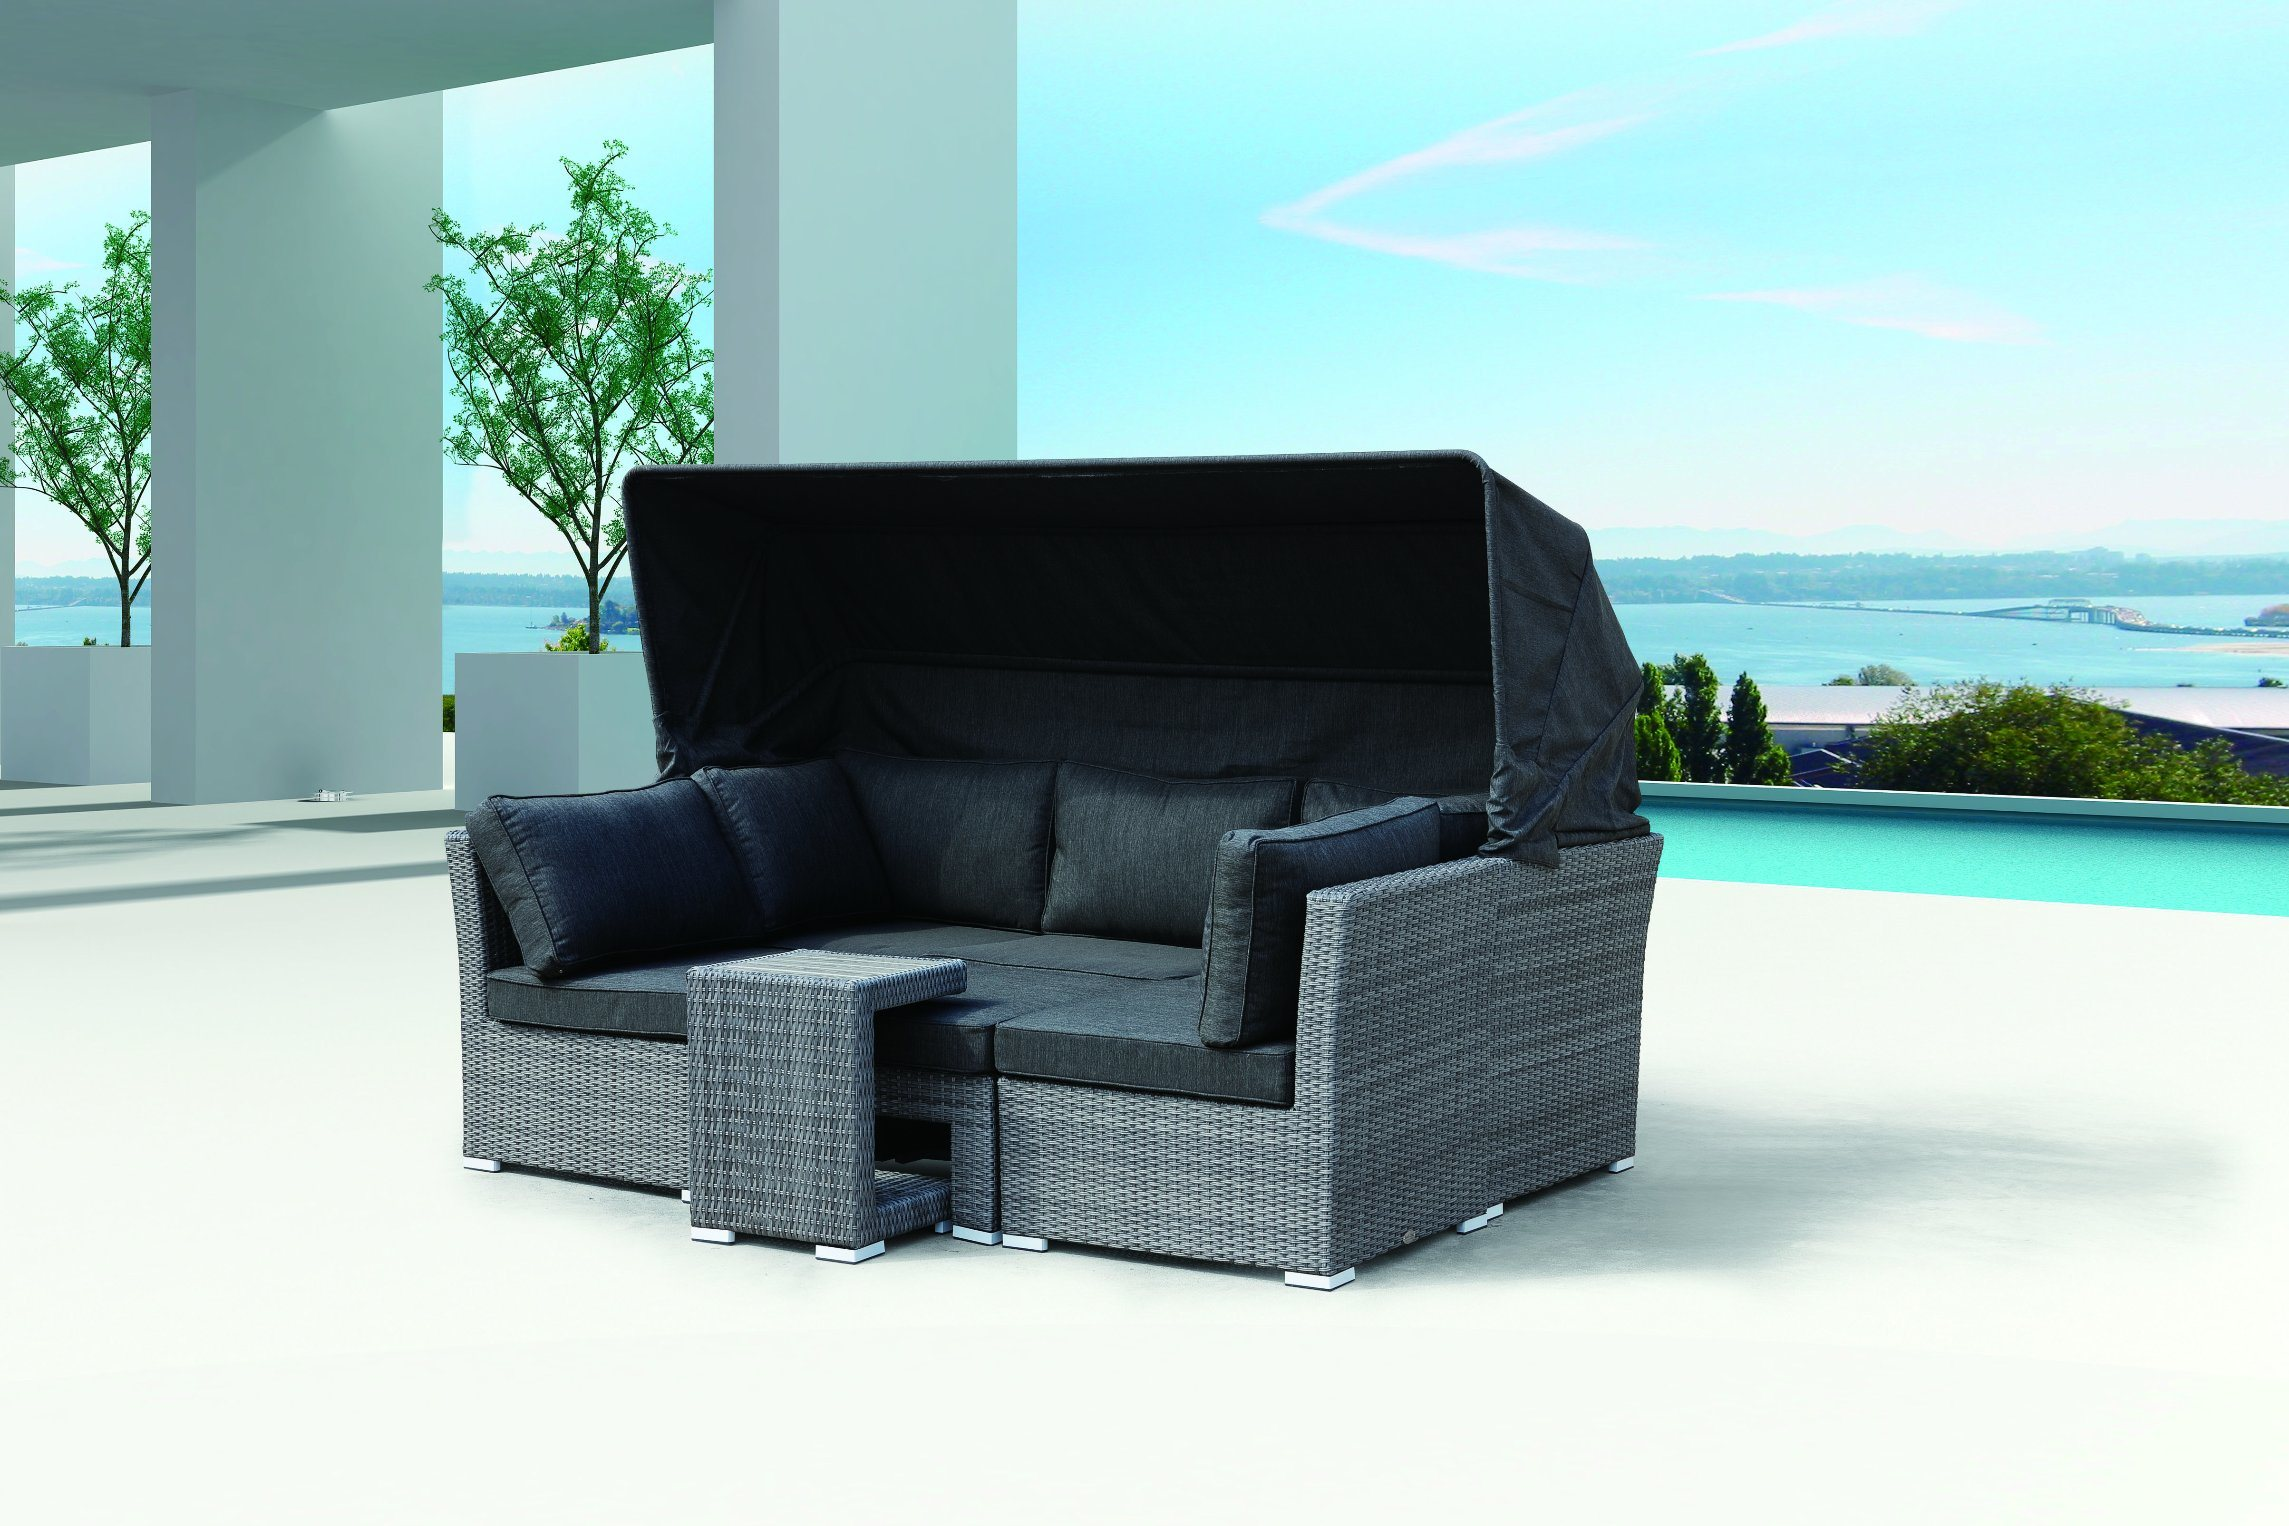 Garden Patio Lounger Beach Chair Rattan Tent Sofa Granada Lounge Set Outdoor Furniture (J547)